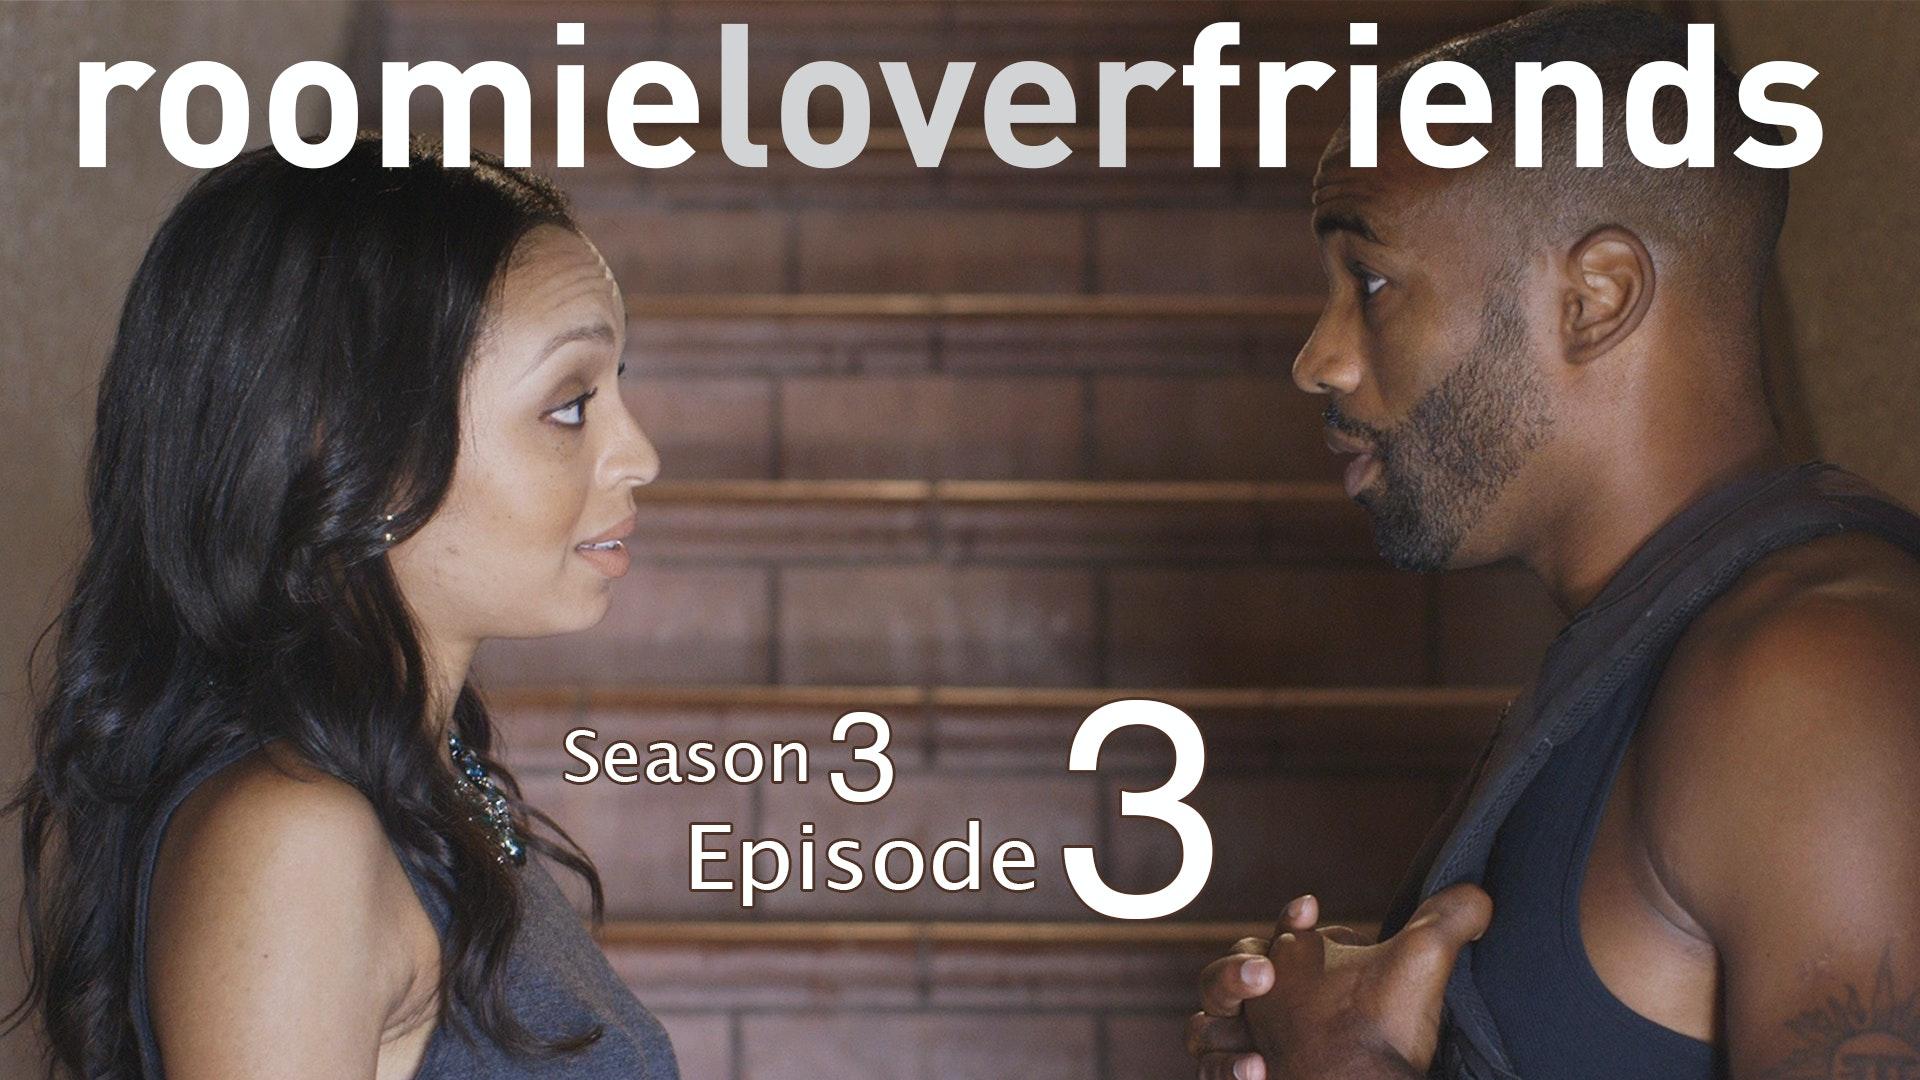 Blackandsexytv roomieloverfriends season 3 episode 8